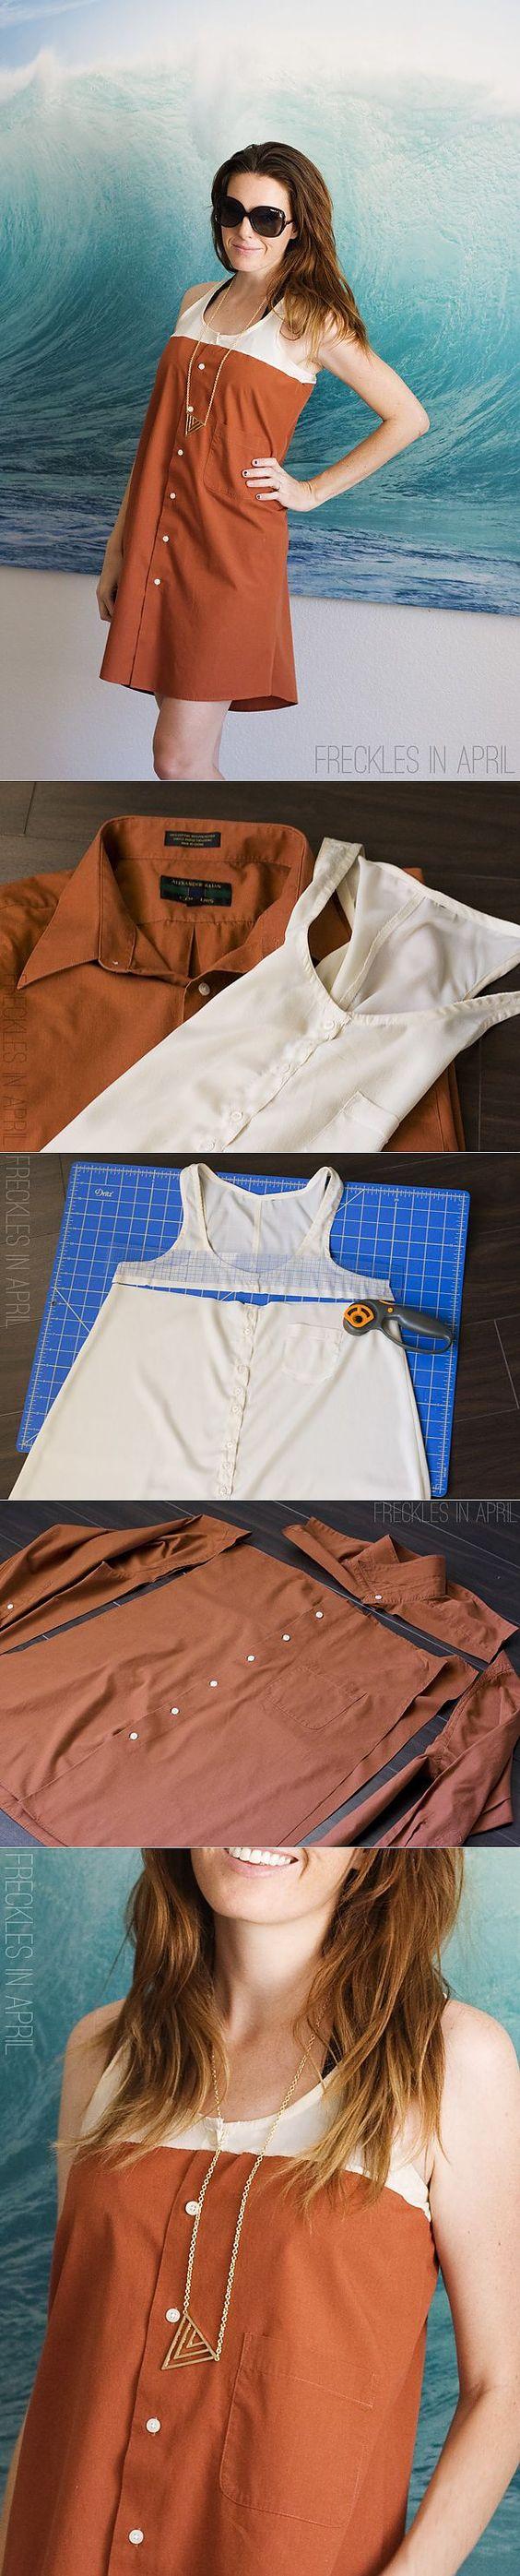 Переделка рубашки в летнее платье (Diy) / Рубашки /: